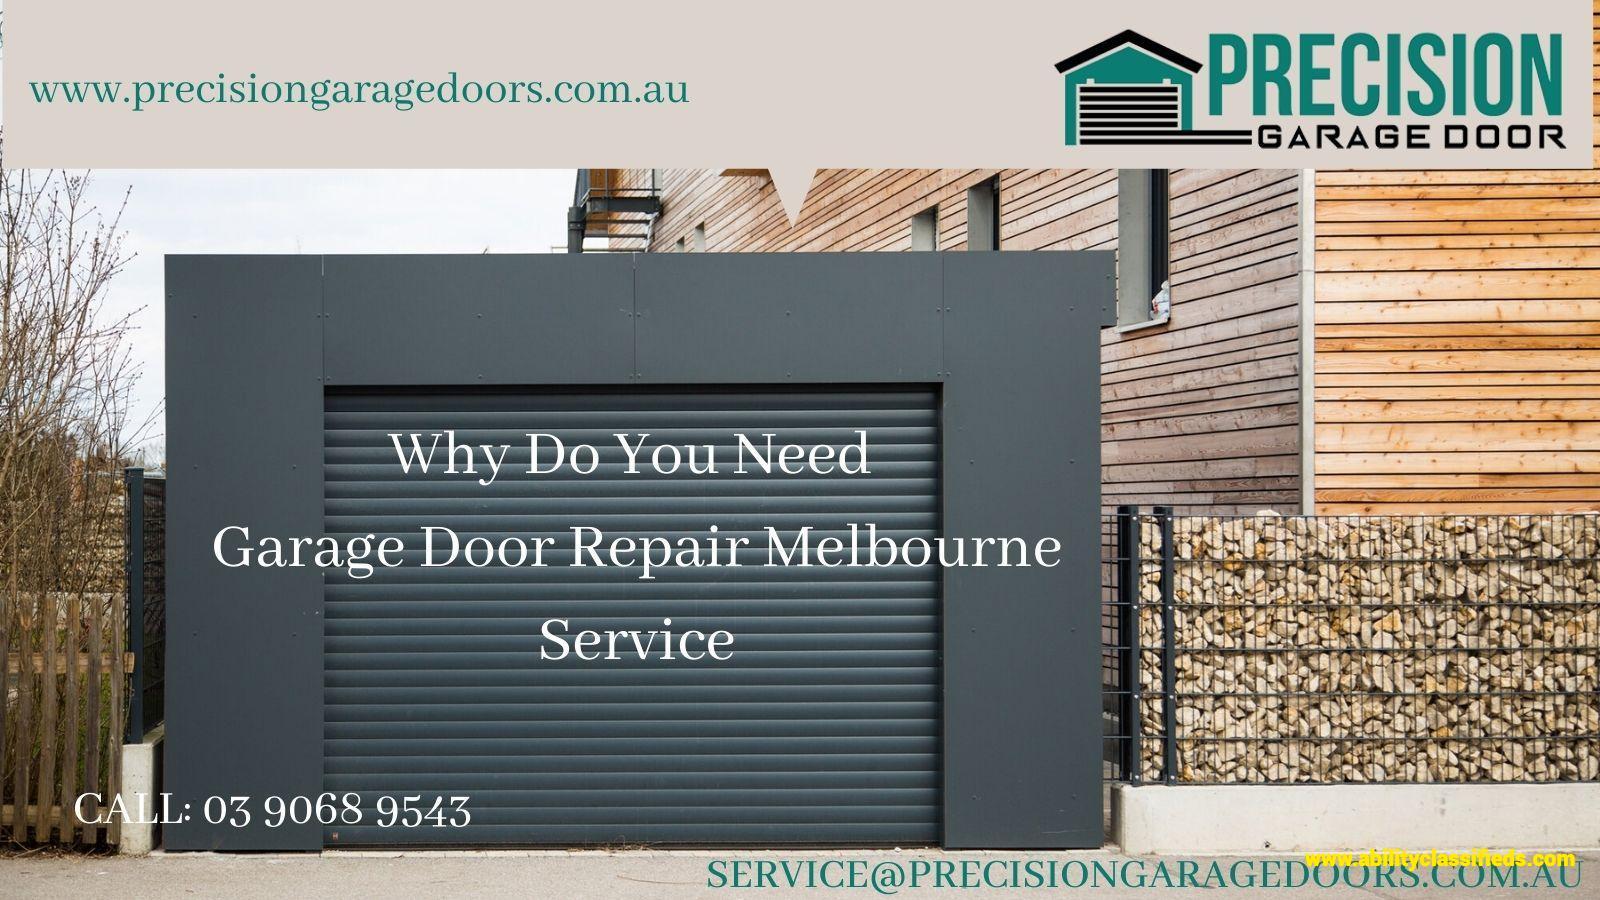 Why Do You Need Garage Door Repair Melbourne Service